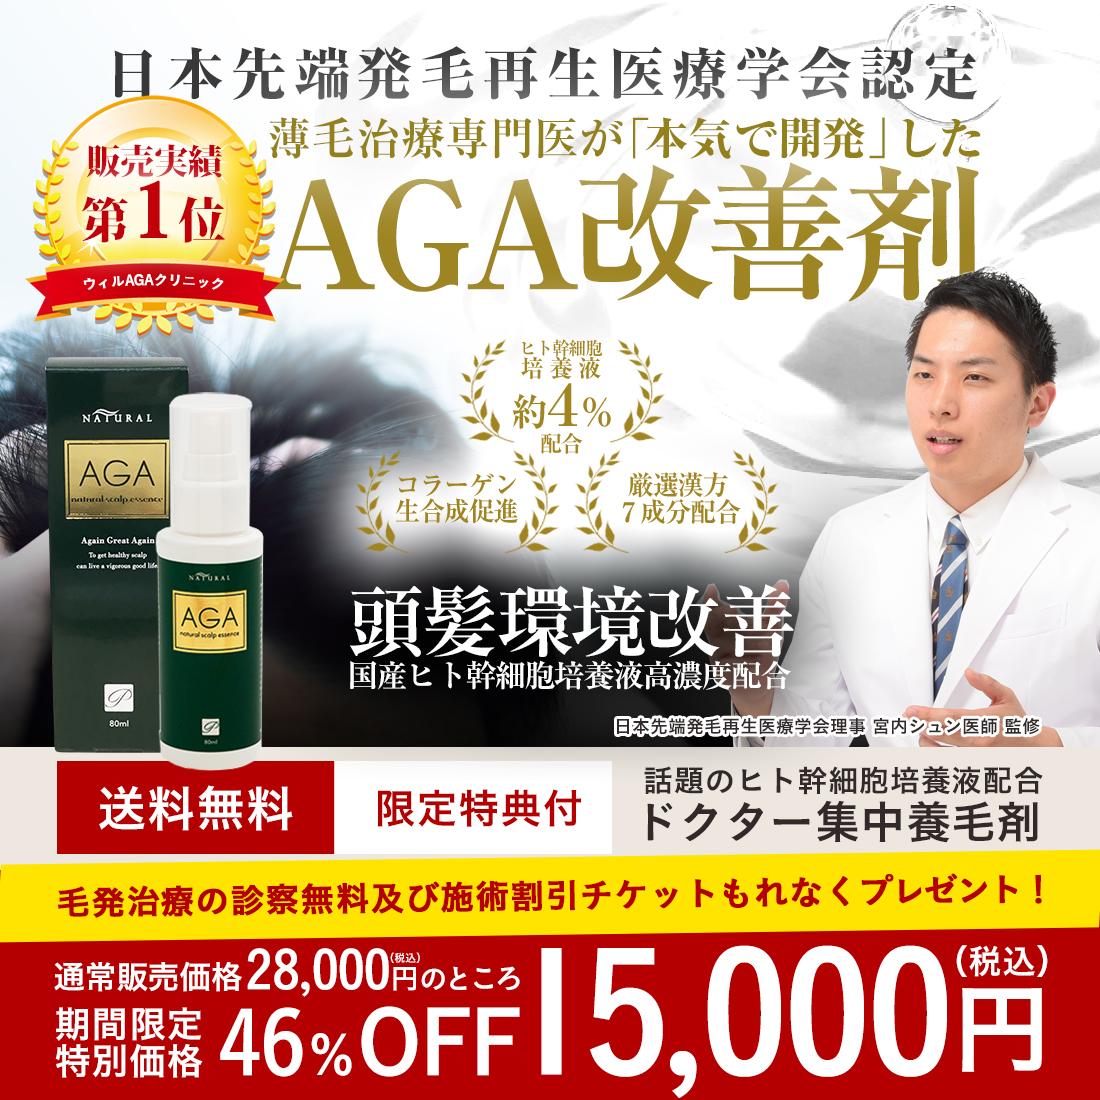 AGA監修 ドクター集中養毛剤 話題のヒト幹細胞培養液配合 AGAスカルプエッセンス 【80ml】